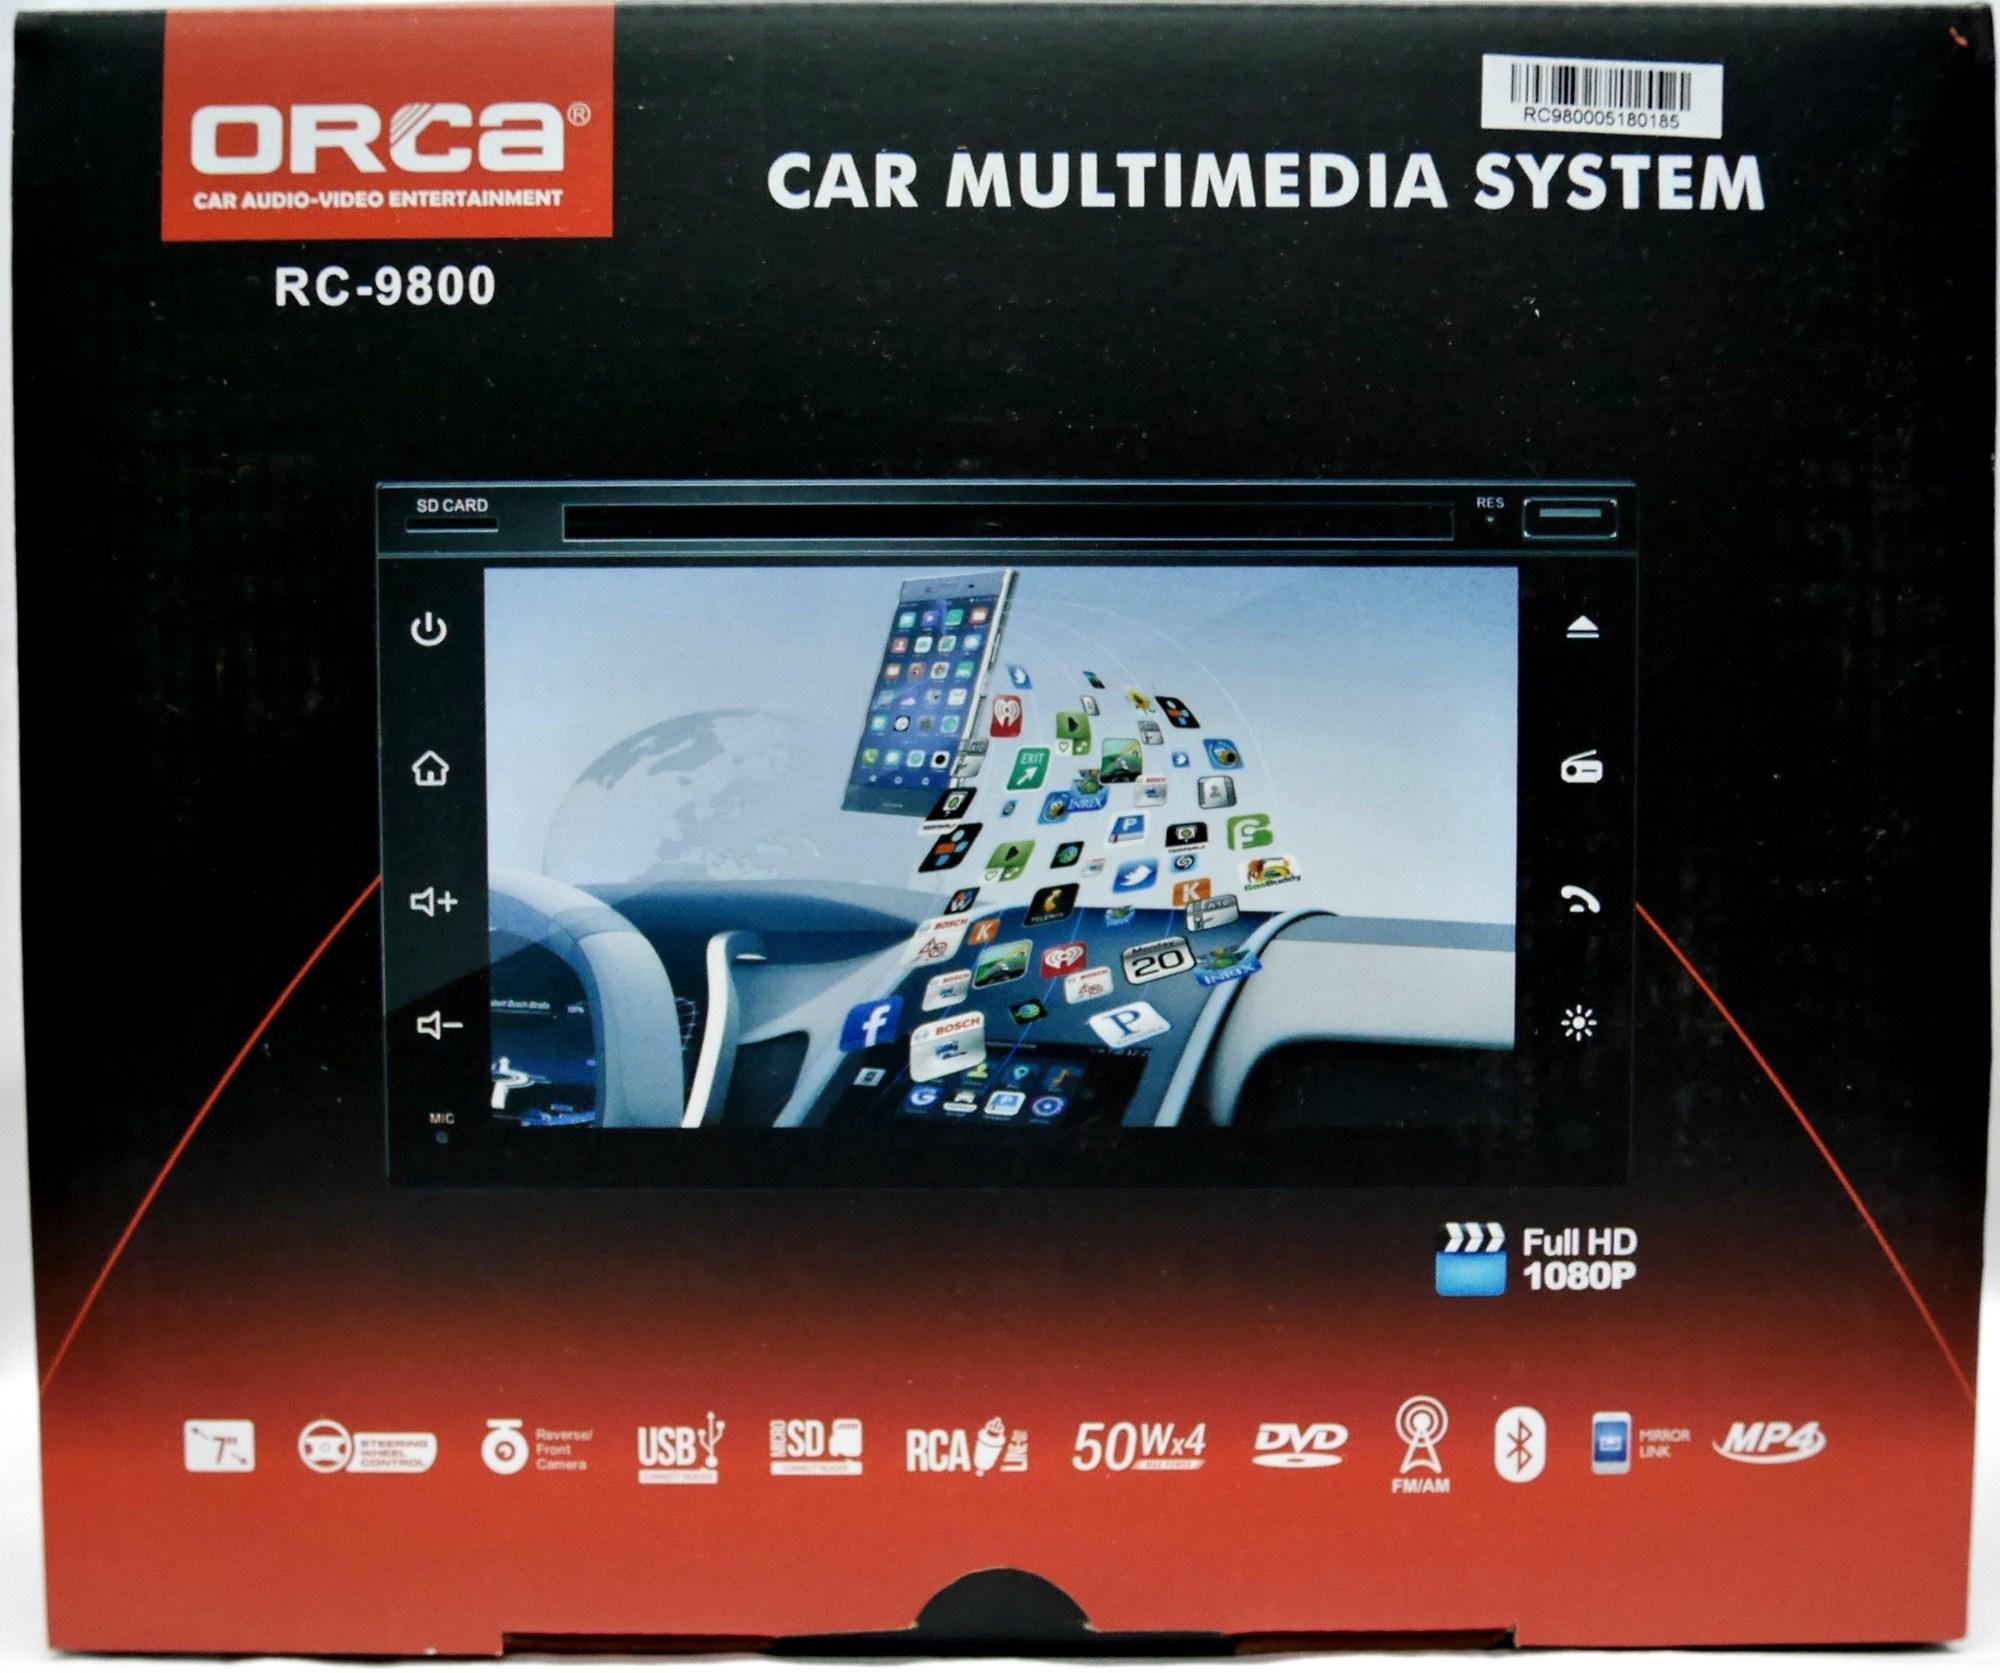 Kelebihan Orca Rc 9800 Mirrorlink Mp4 Head Unit Double Din 7 Inch Sansui 5202 I Osaka Support Dan Full Hd